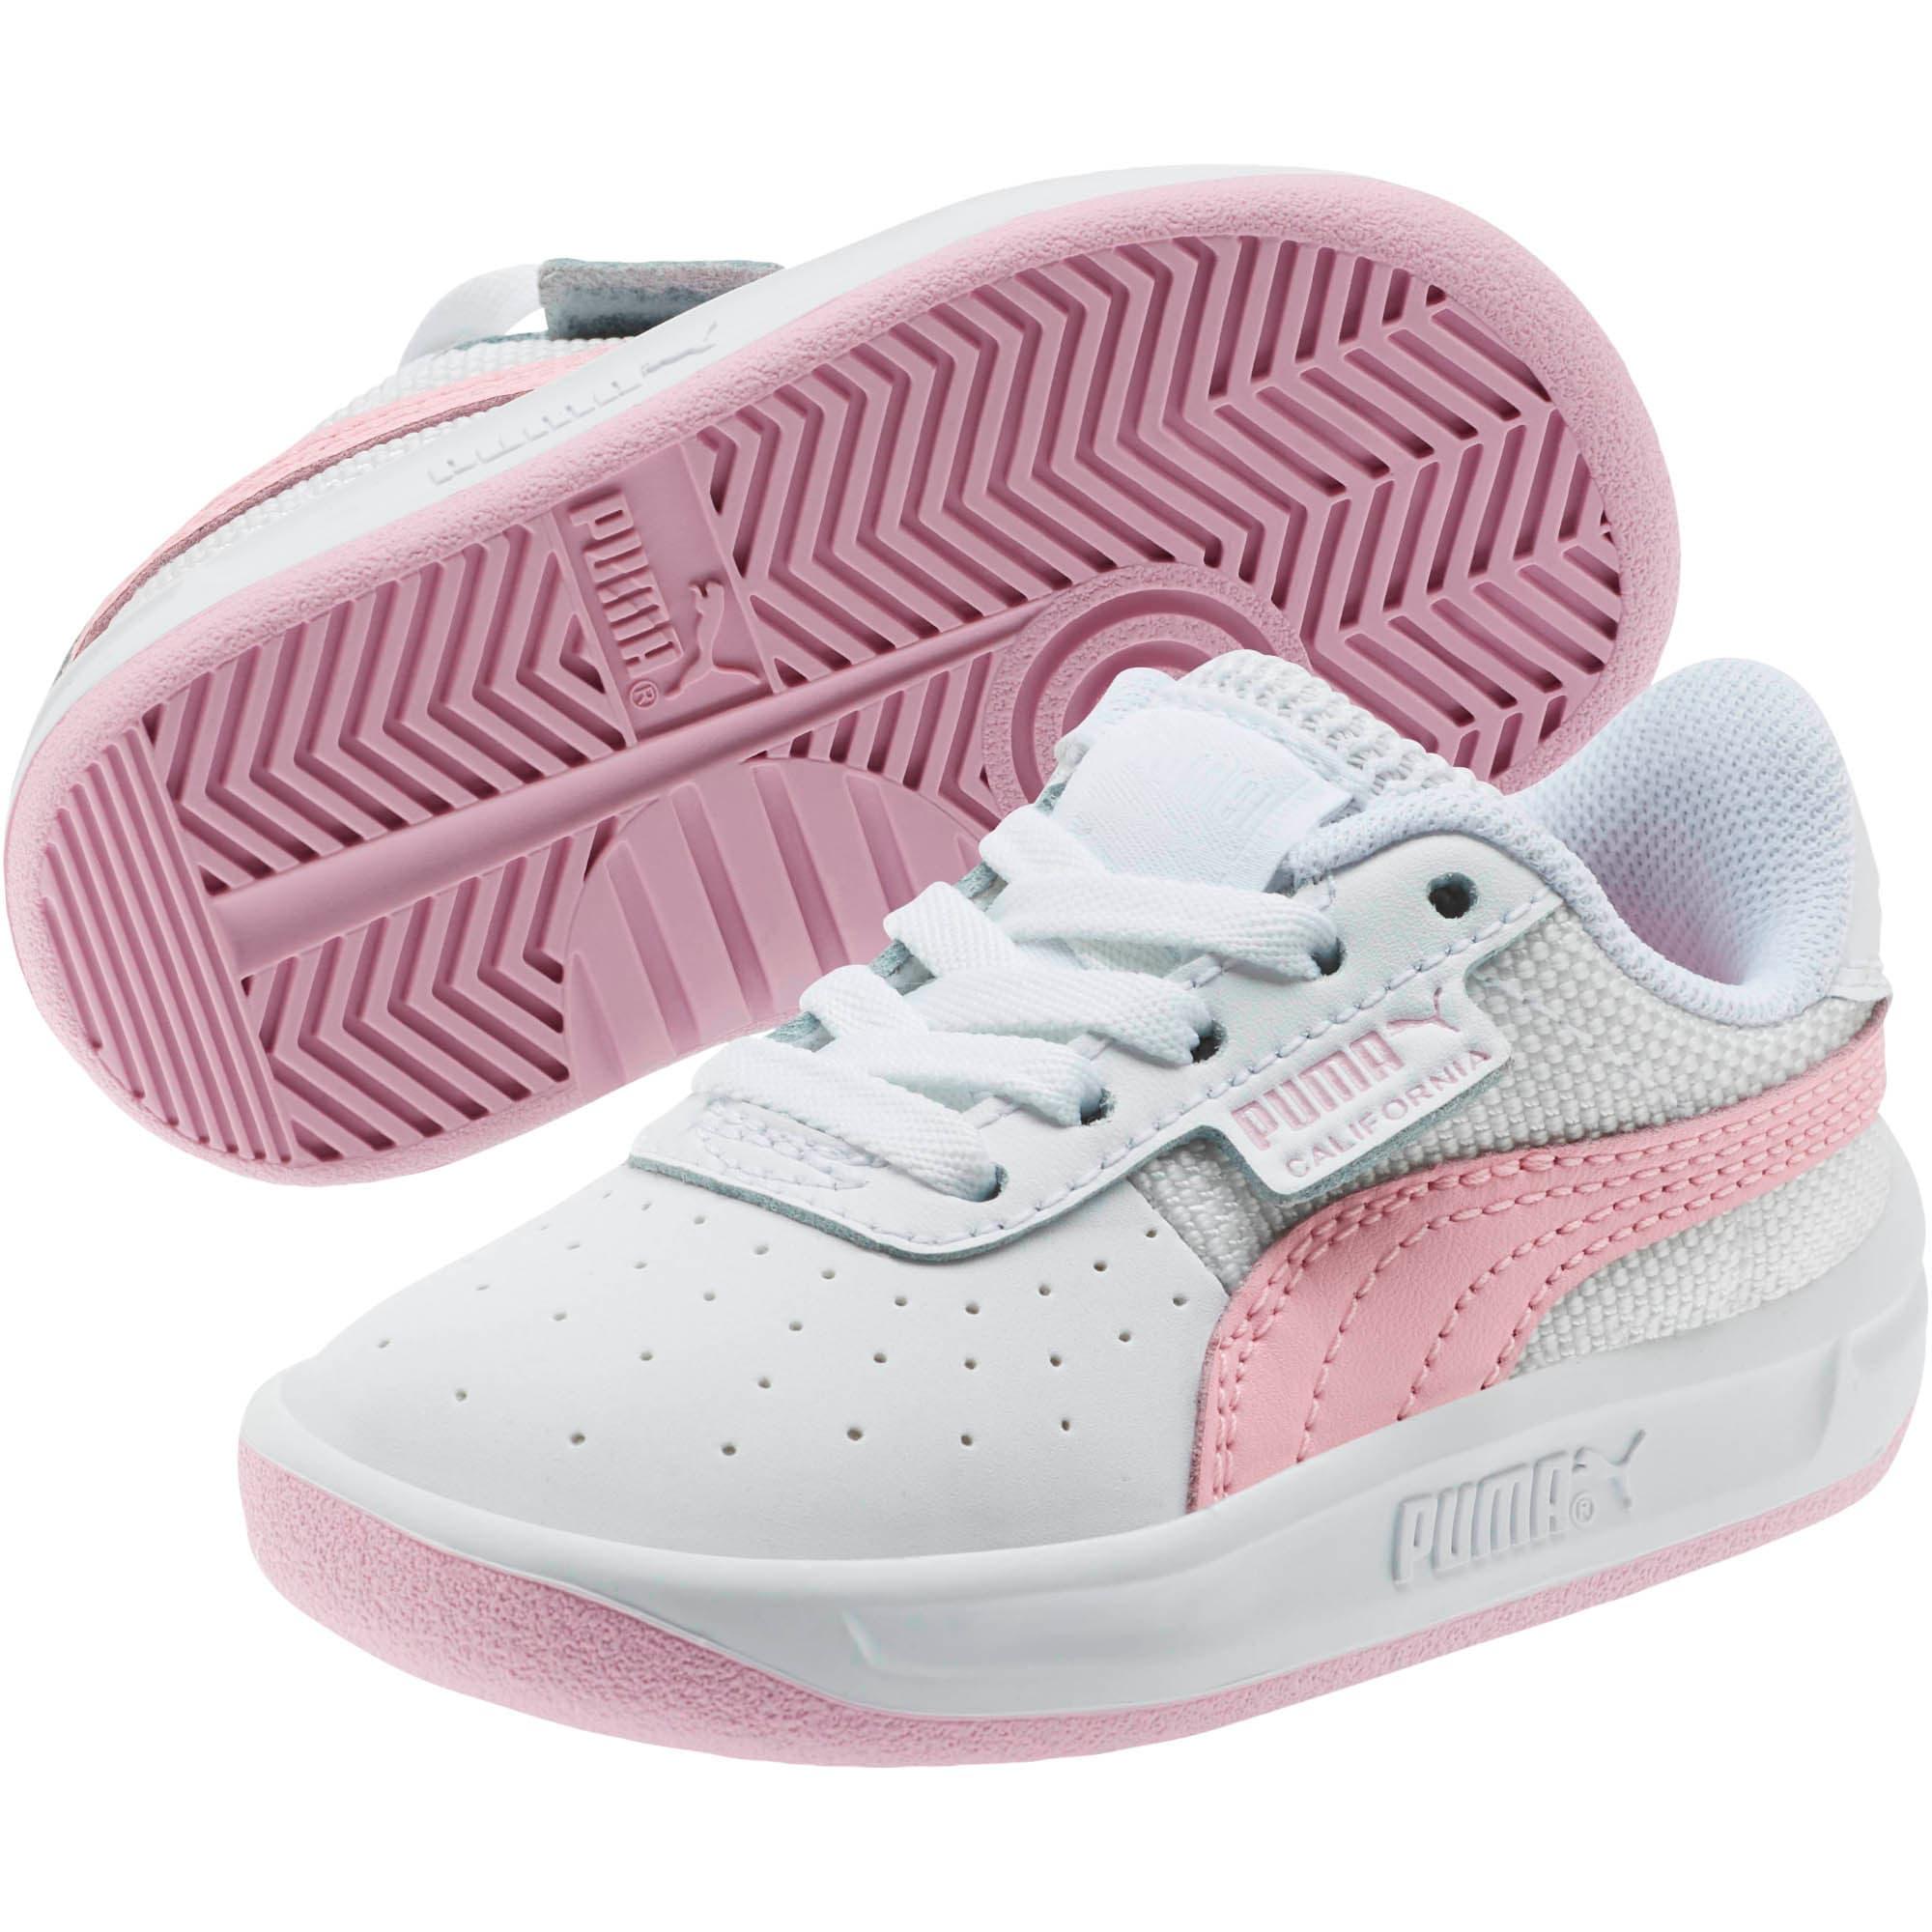 Thumbnail 2 of California Toddler Shoes, Puma Wht-Pale Pink-Puma Wht, medium